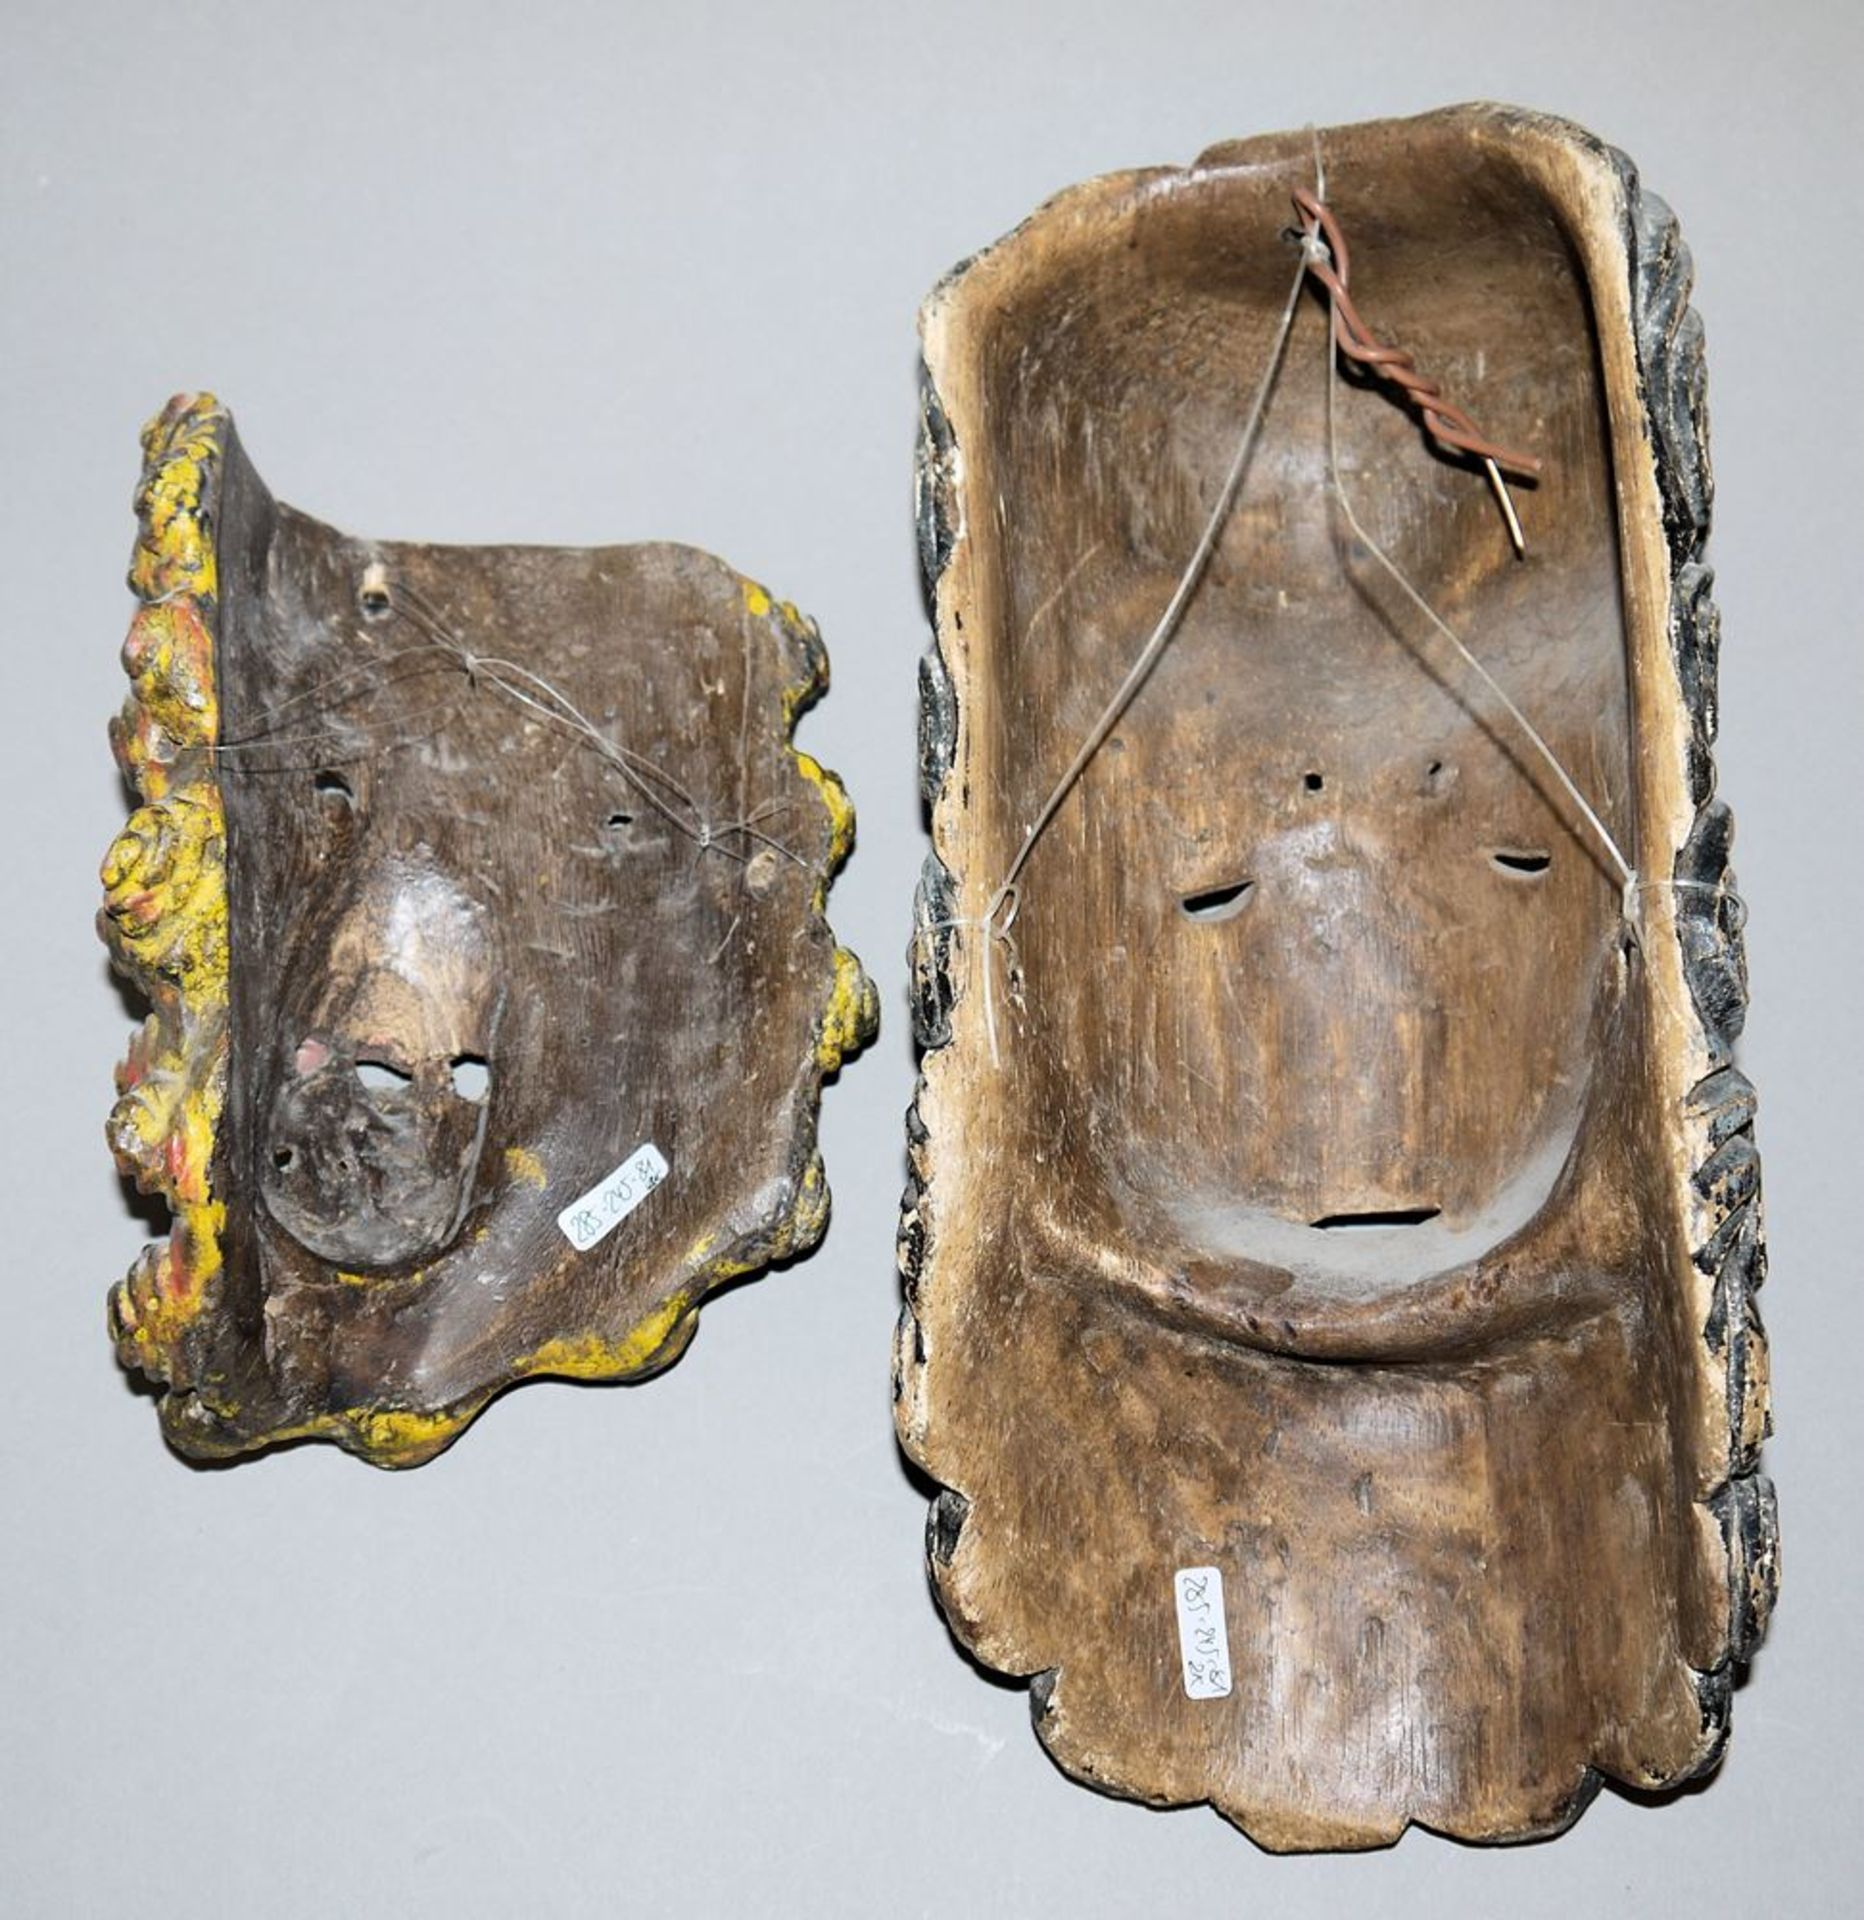 Los 584 - Zwei Tanzmasken aus Guatemala